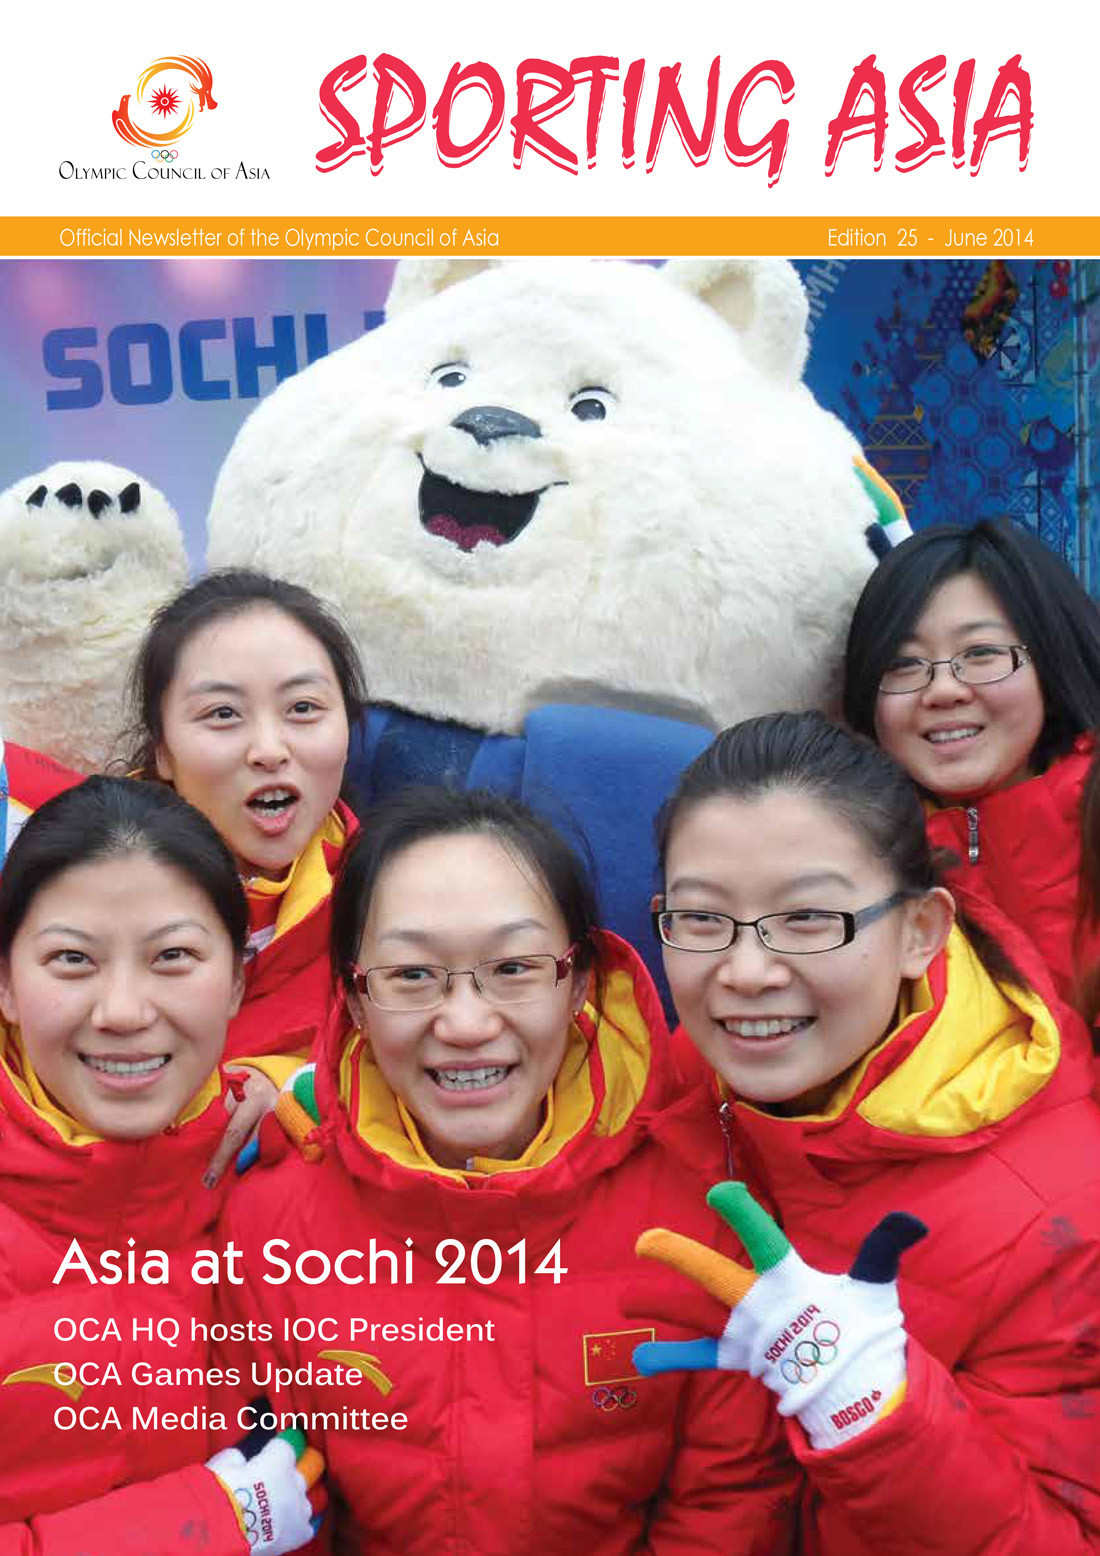 Sporting Asia - Edition 25 - JUN 2014